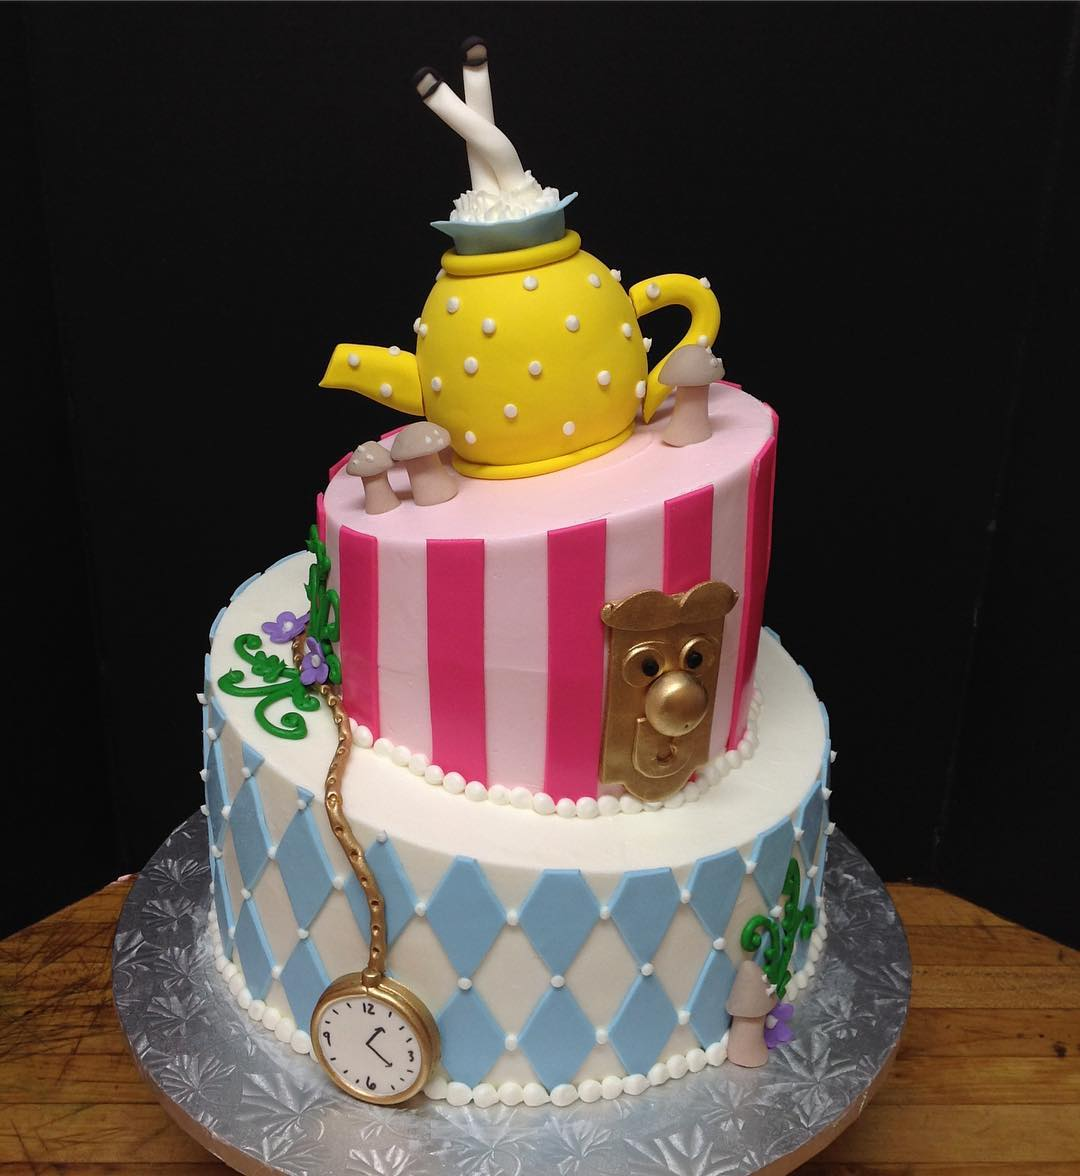 #cakesofinstagram #cakestagram #aliceinwonderland